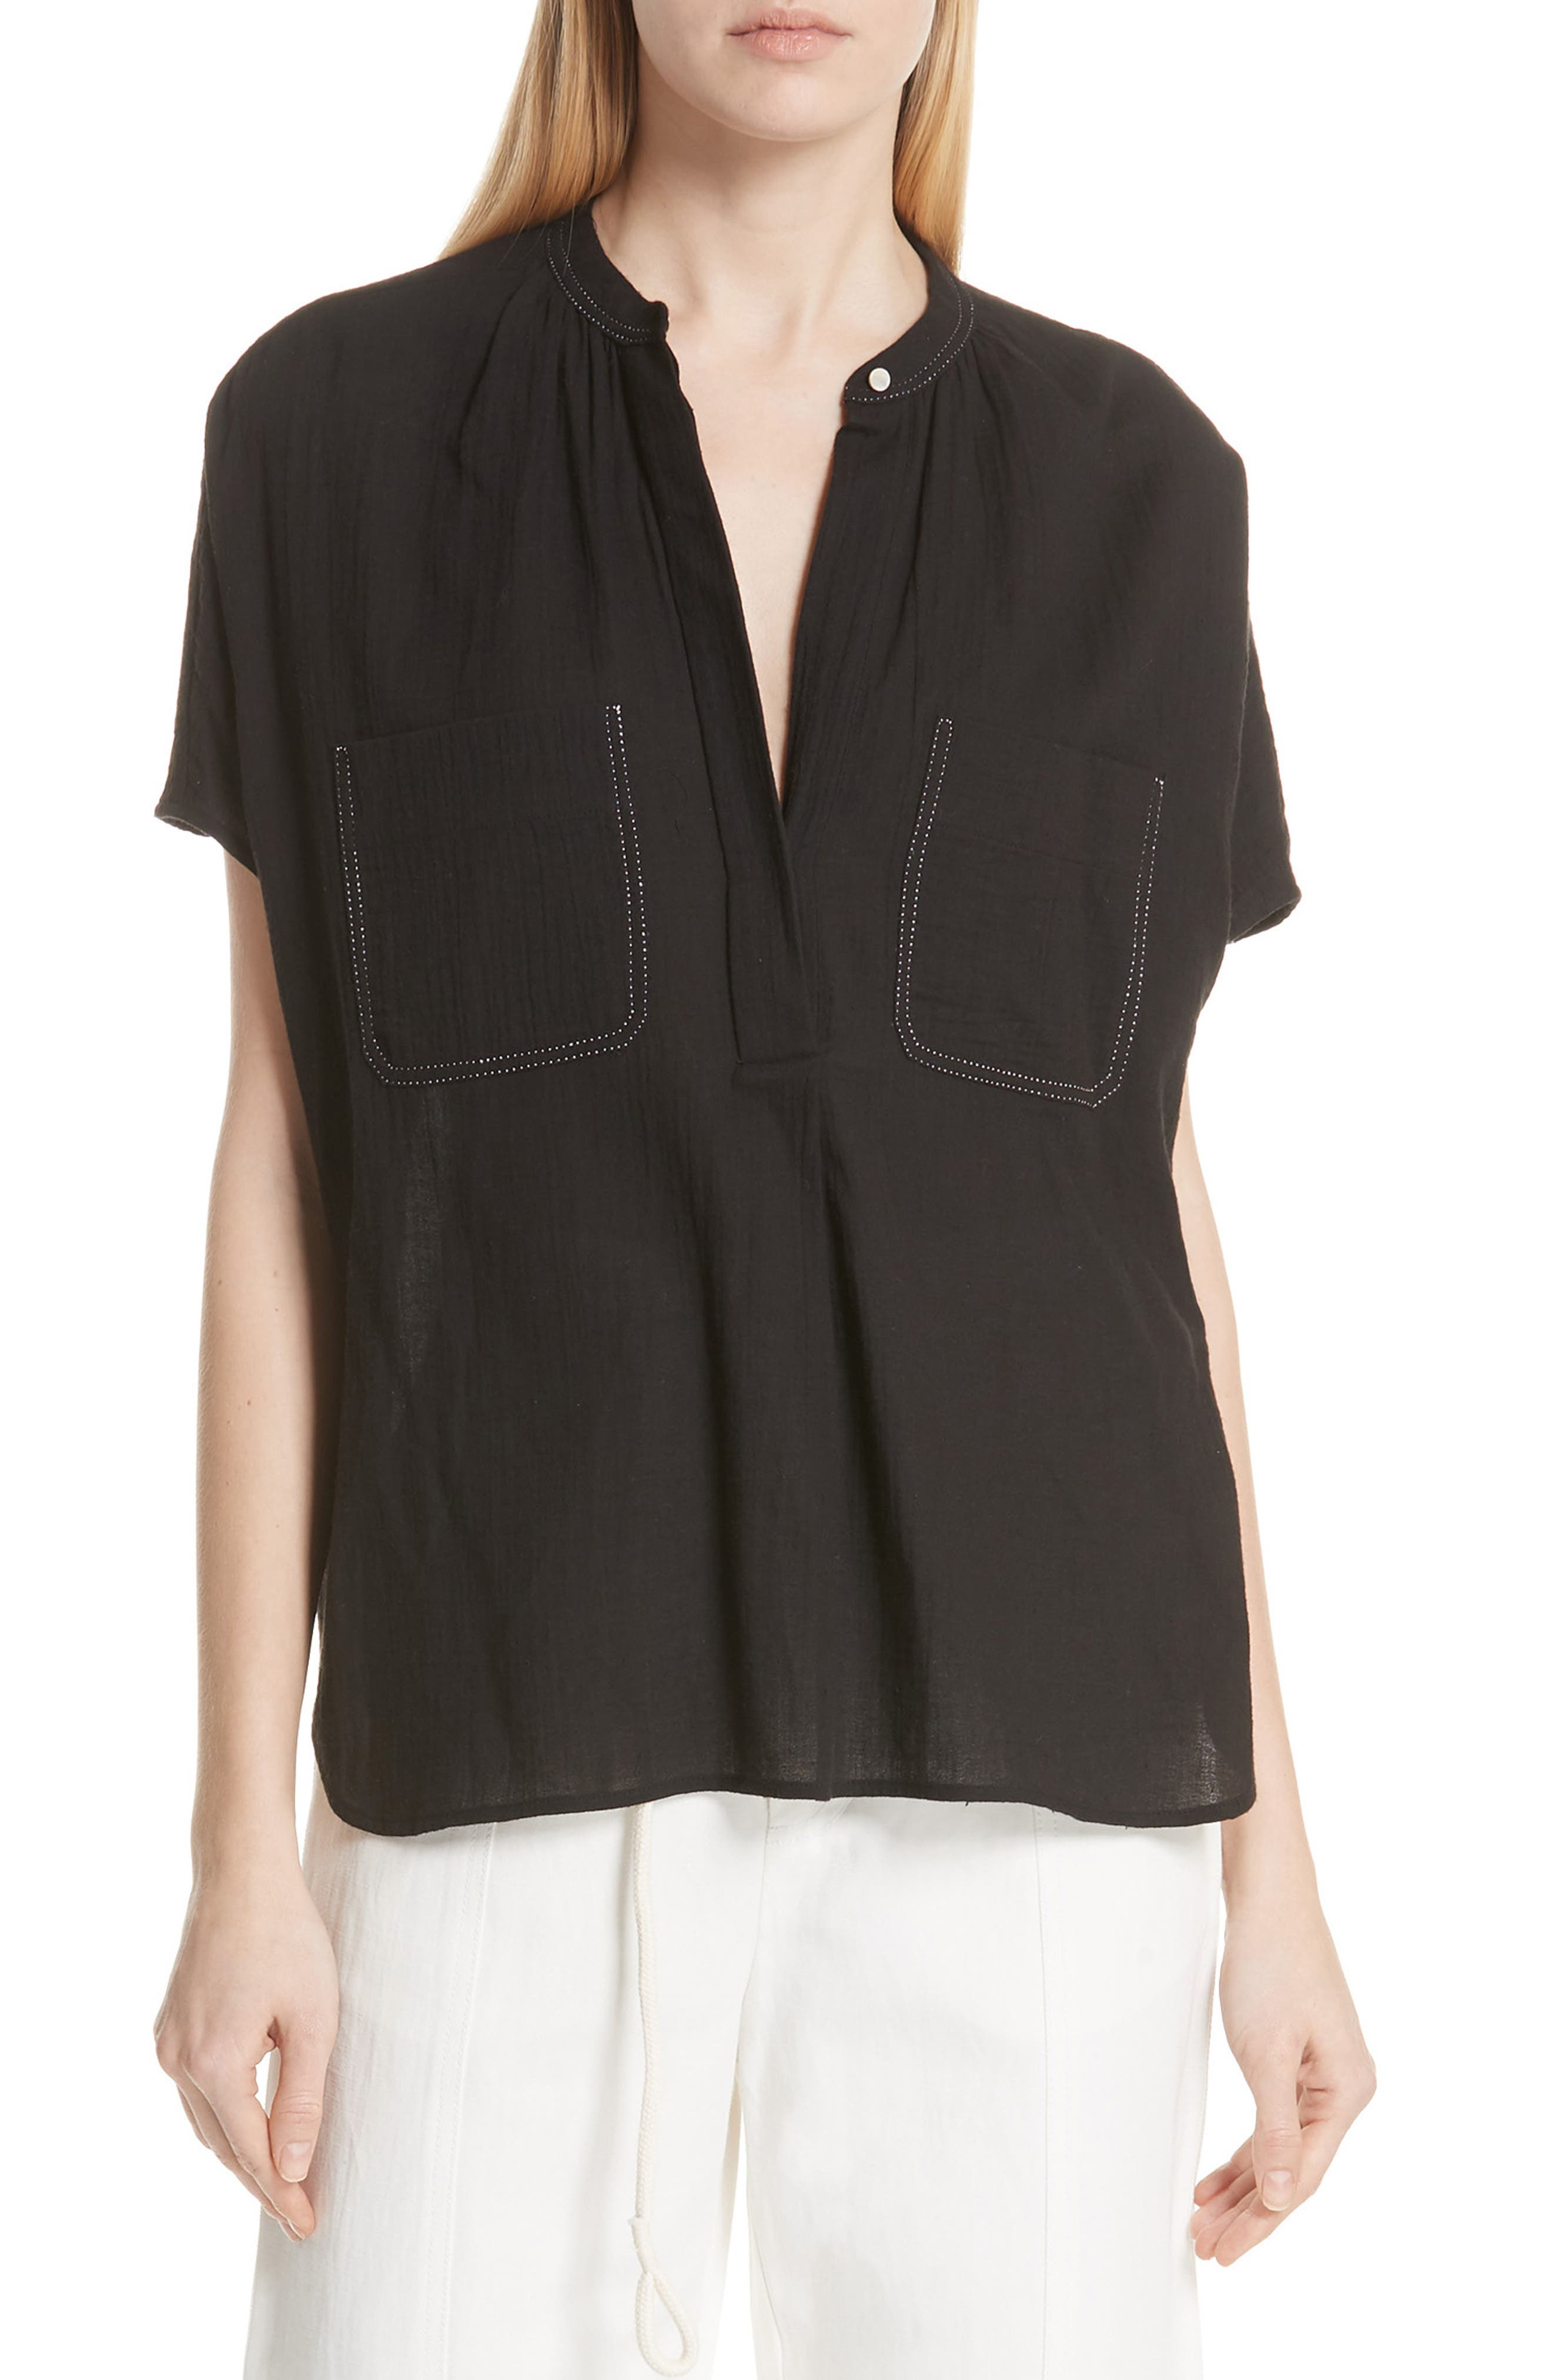 Topstitch Crinkle Cotton Top,                         Main,                         color, Black